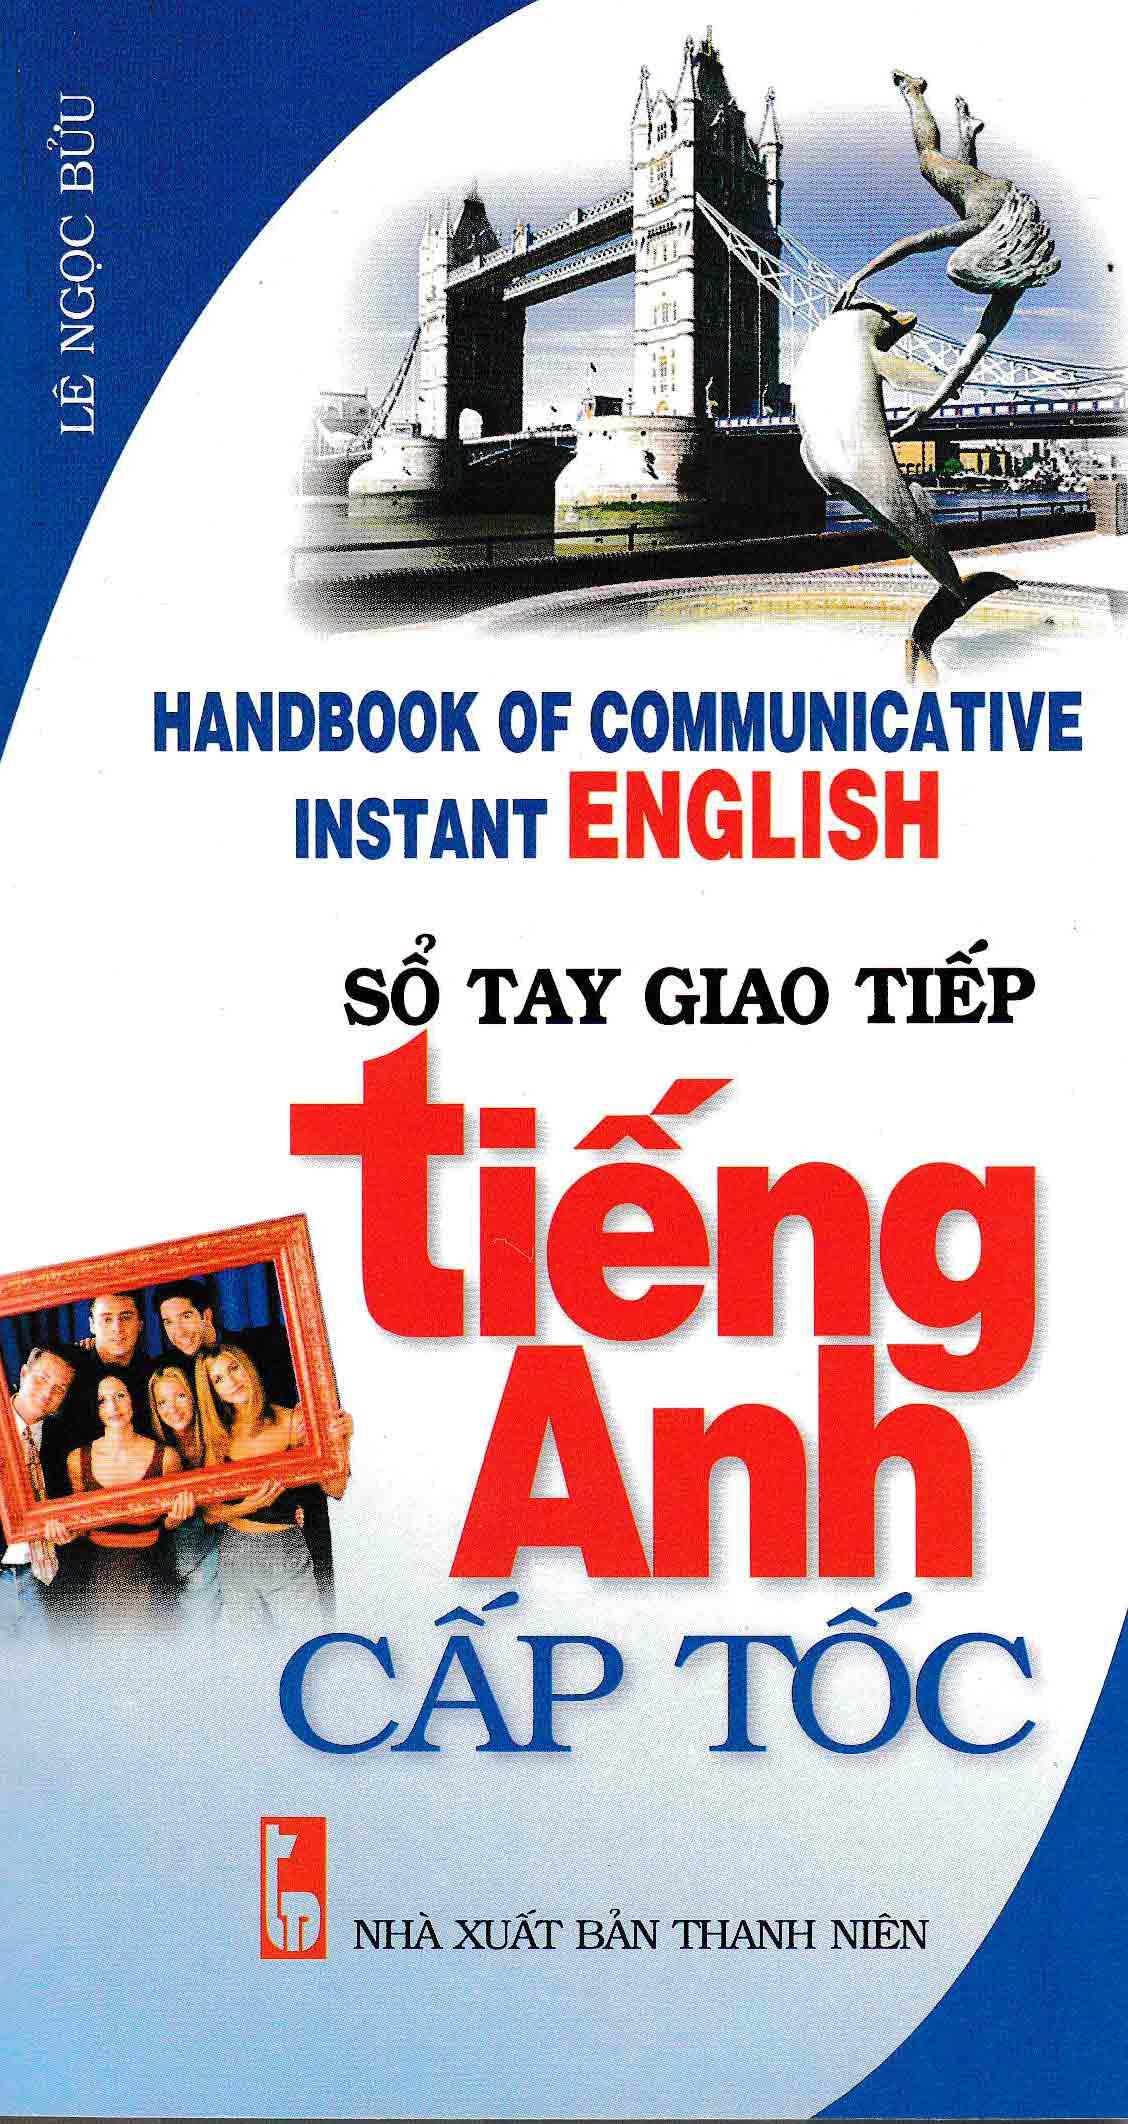 Sổ Tay Giao Tiếp Tiếng Anh Cấp Tốc